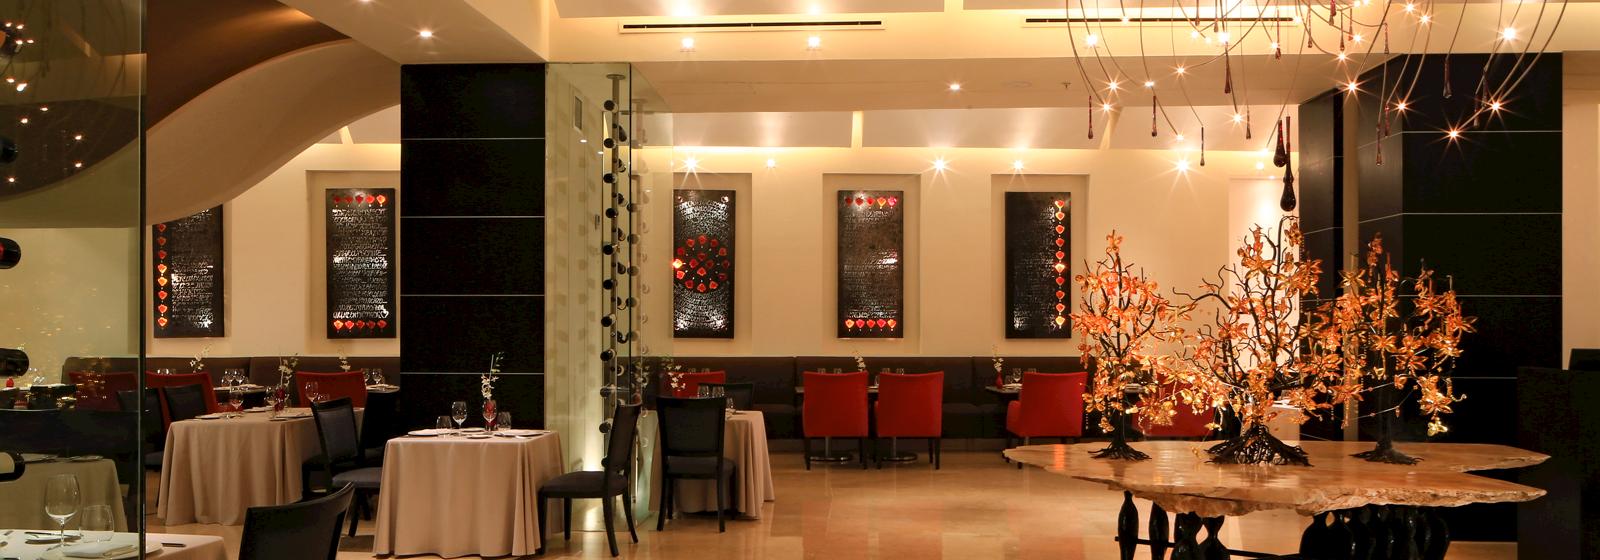 Piaf Restaurant of Grand Velas Riviera Nayarit